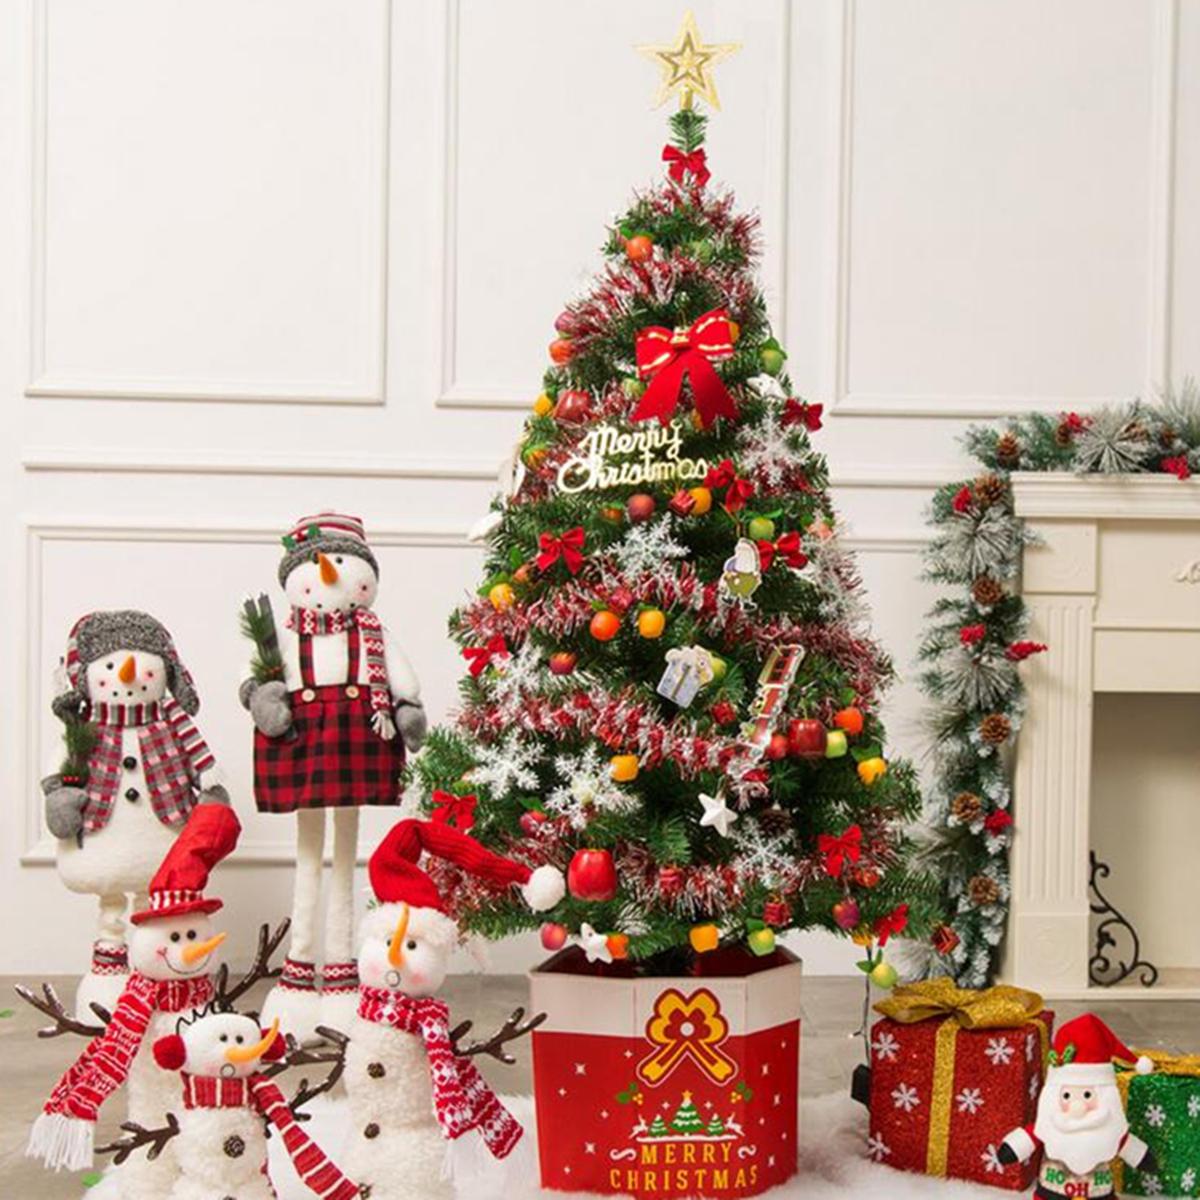 3 7ft Pre Lit Fiber Optic Artificial Christmas Tree Decoration LED Multicolor Lights Stand